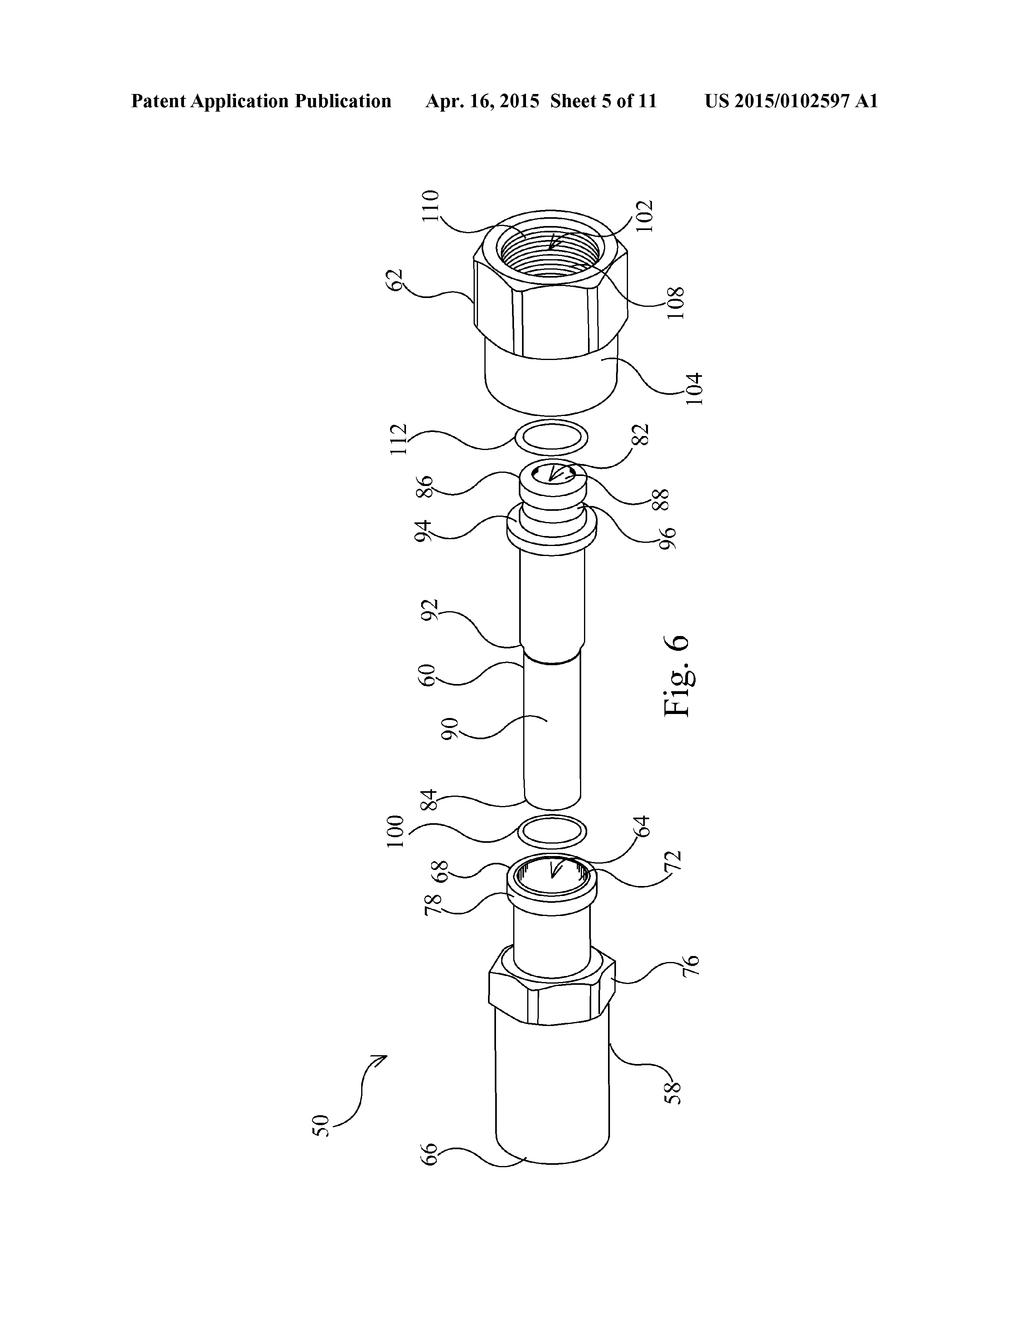 Bobcat 743 Hydraulic Hose Diagram. Diagram. Wiring Diagram